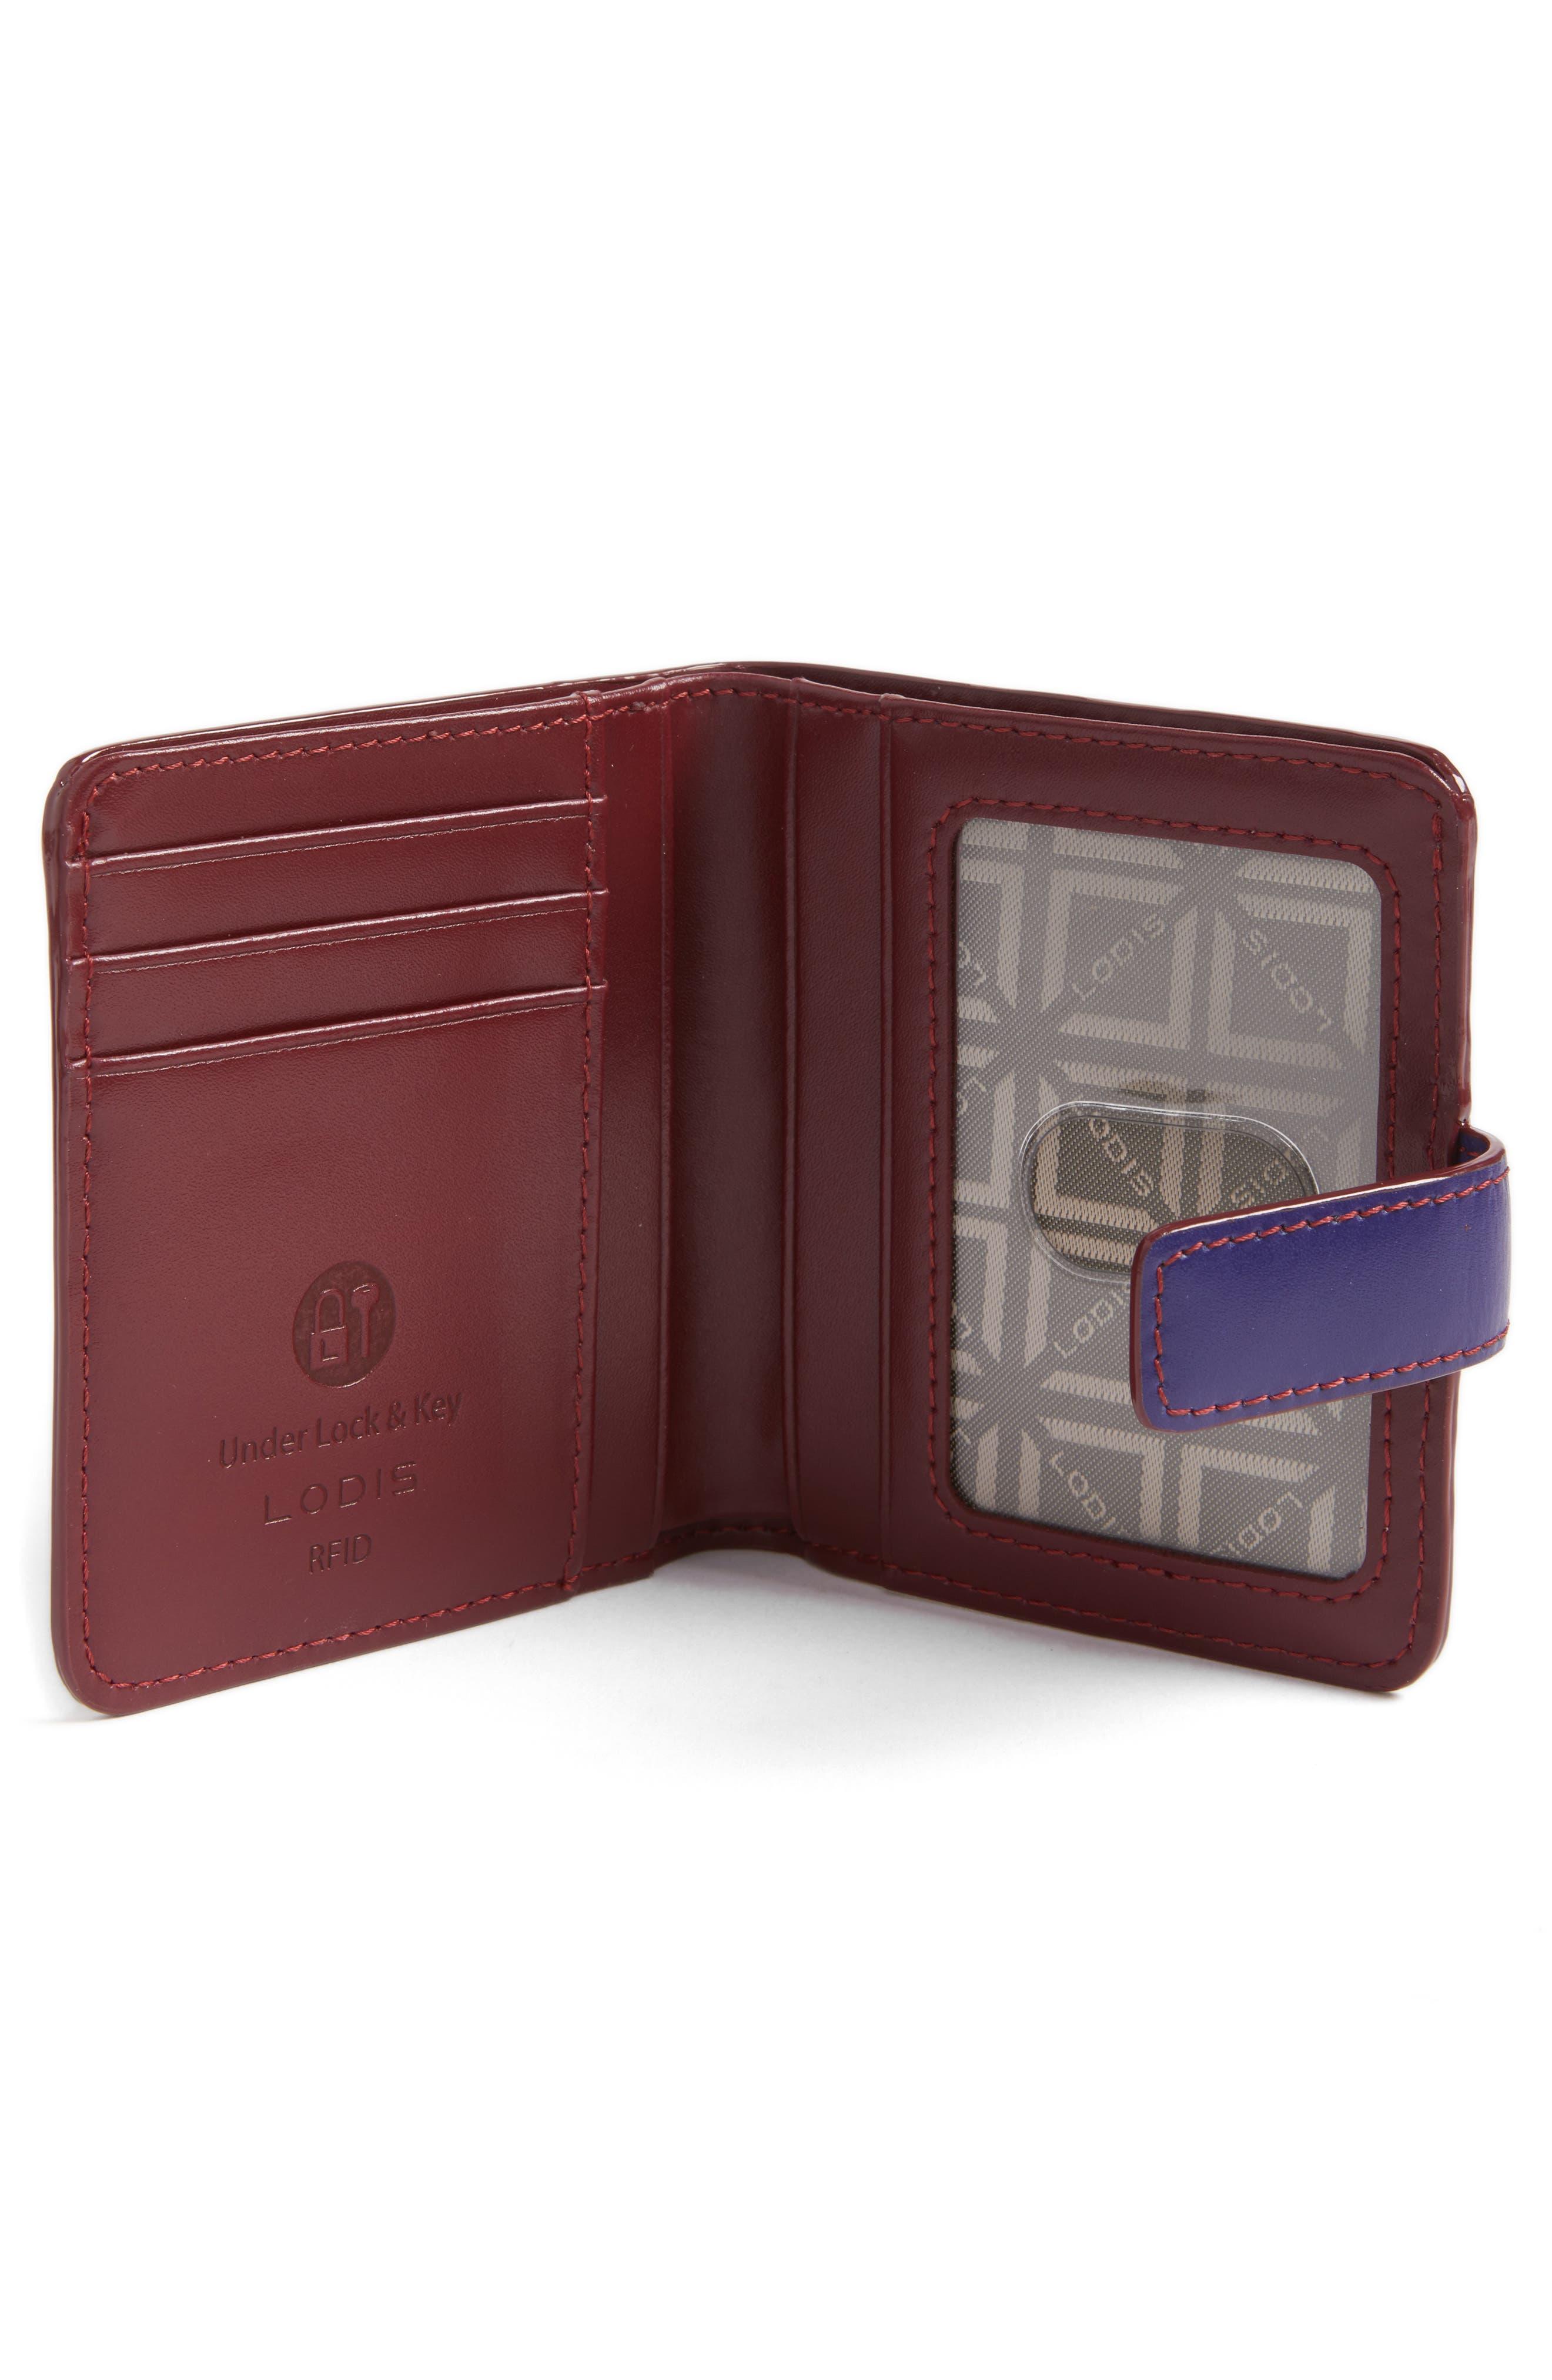 Lodis Petite Audrey RFID Leather Wallet,                             Alternate thumbnail 5, color,